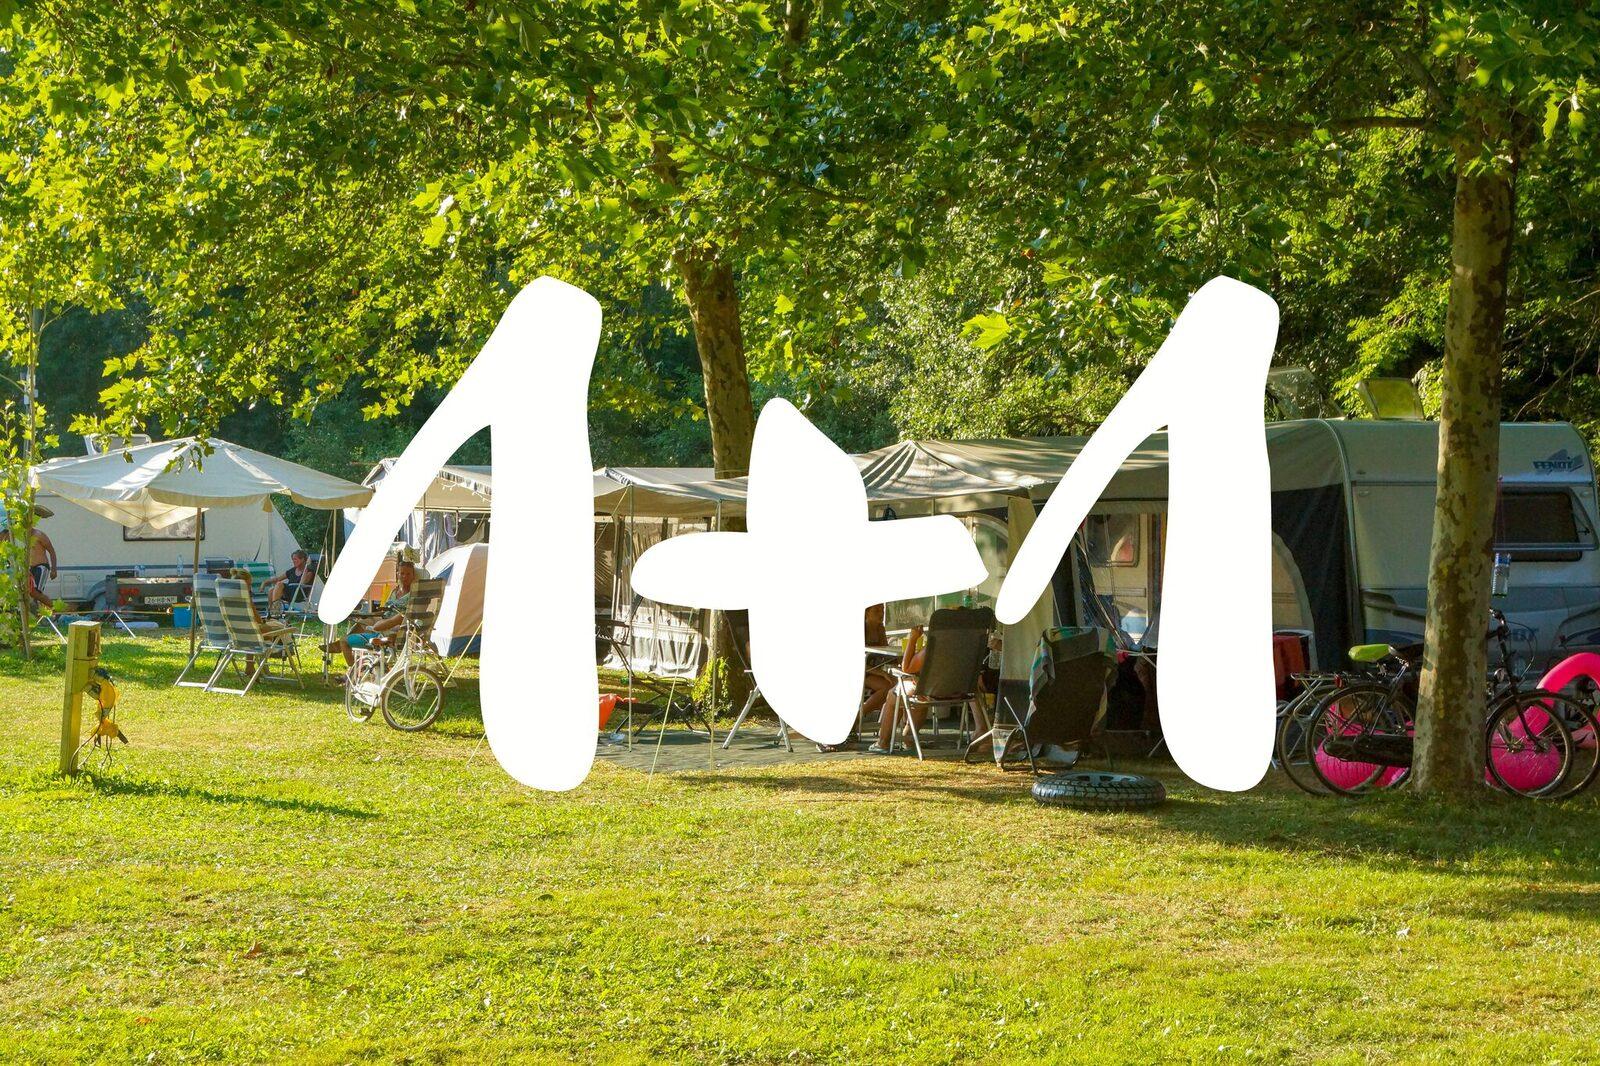 La Draille: 1+1 weken kamperen